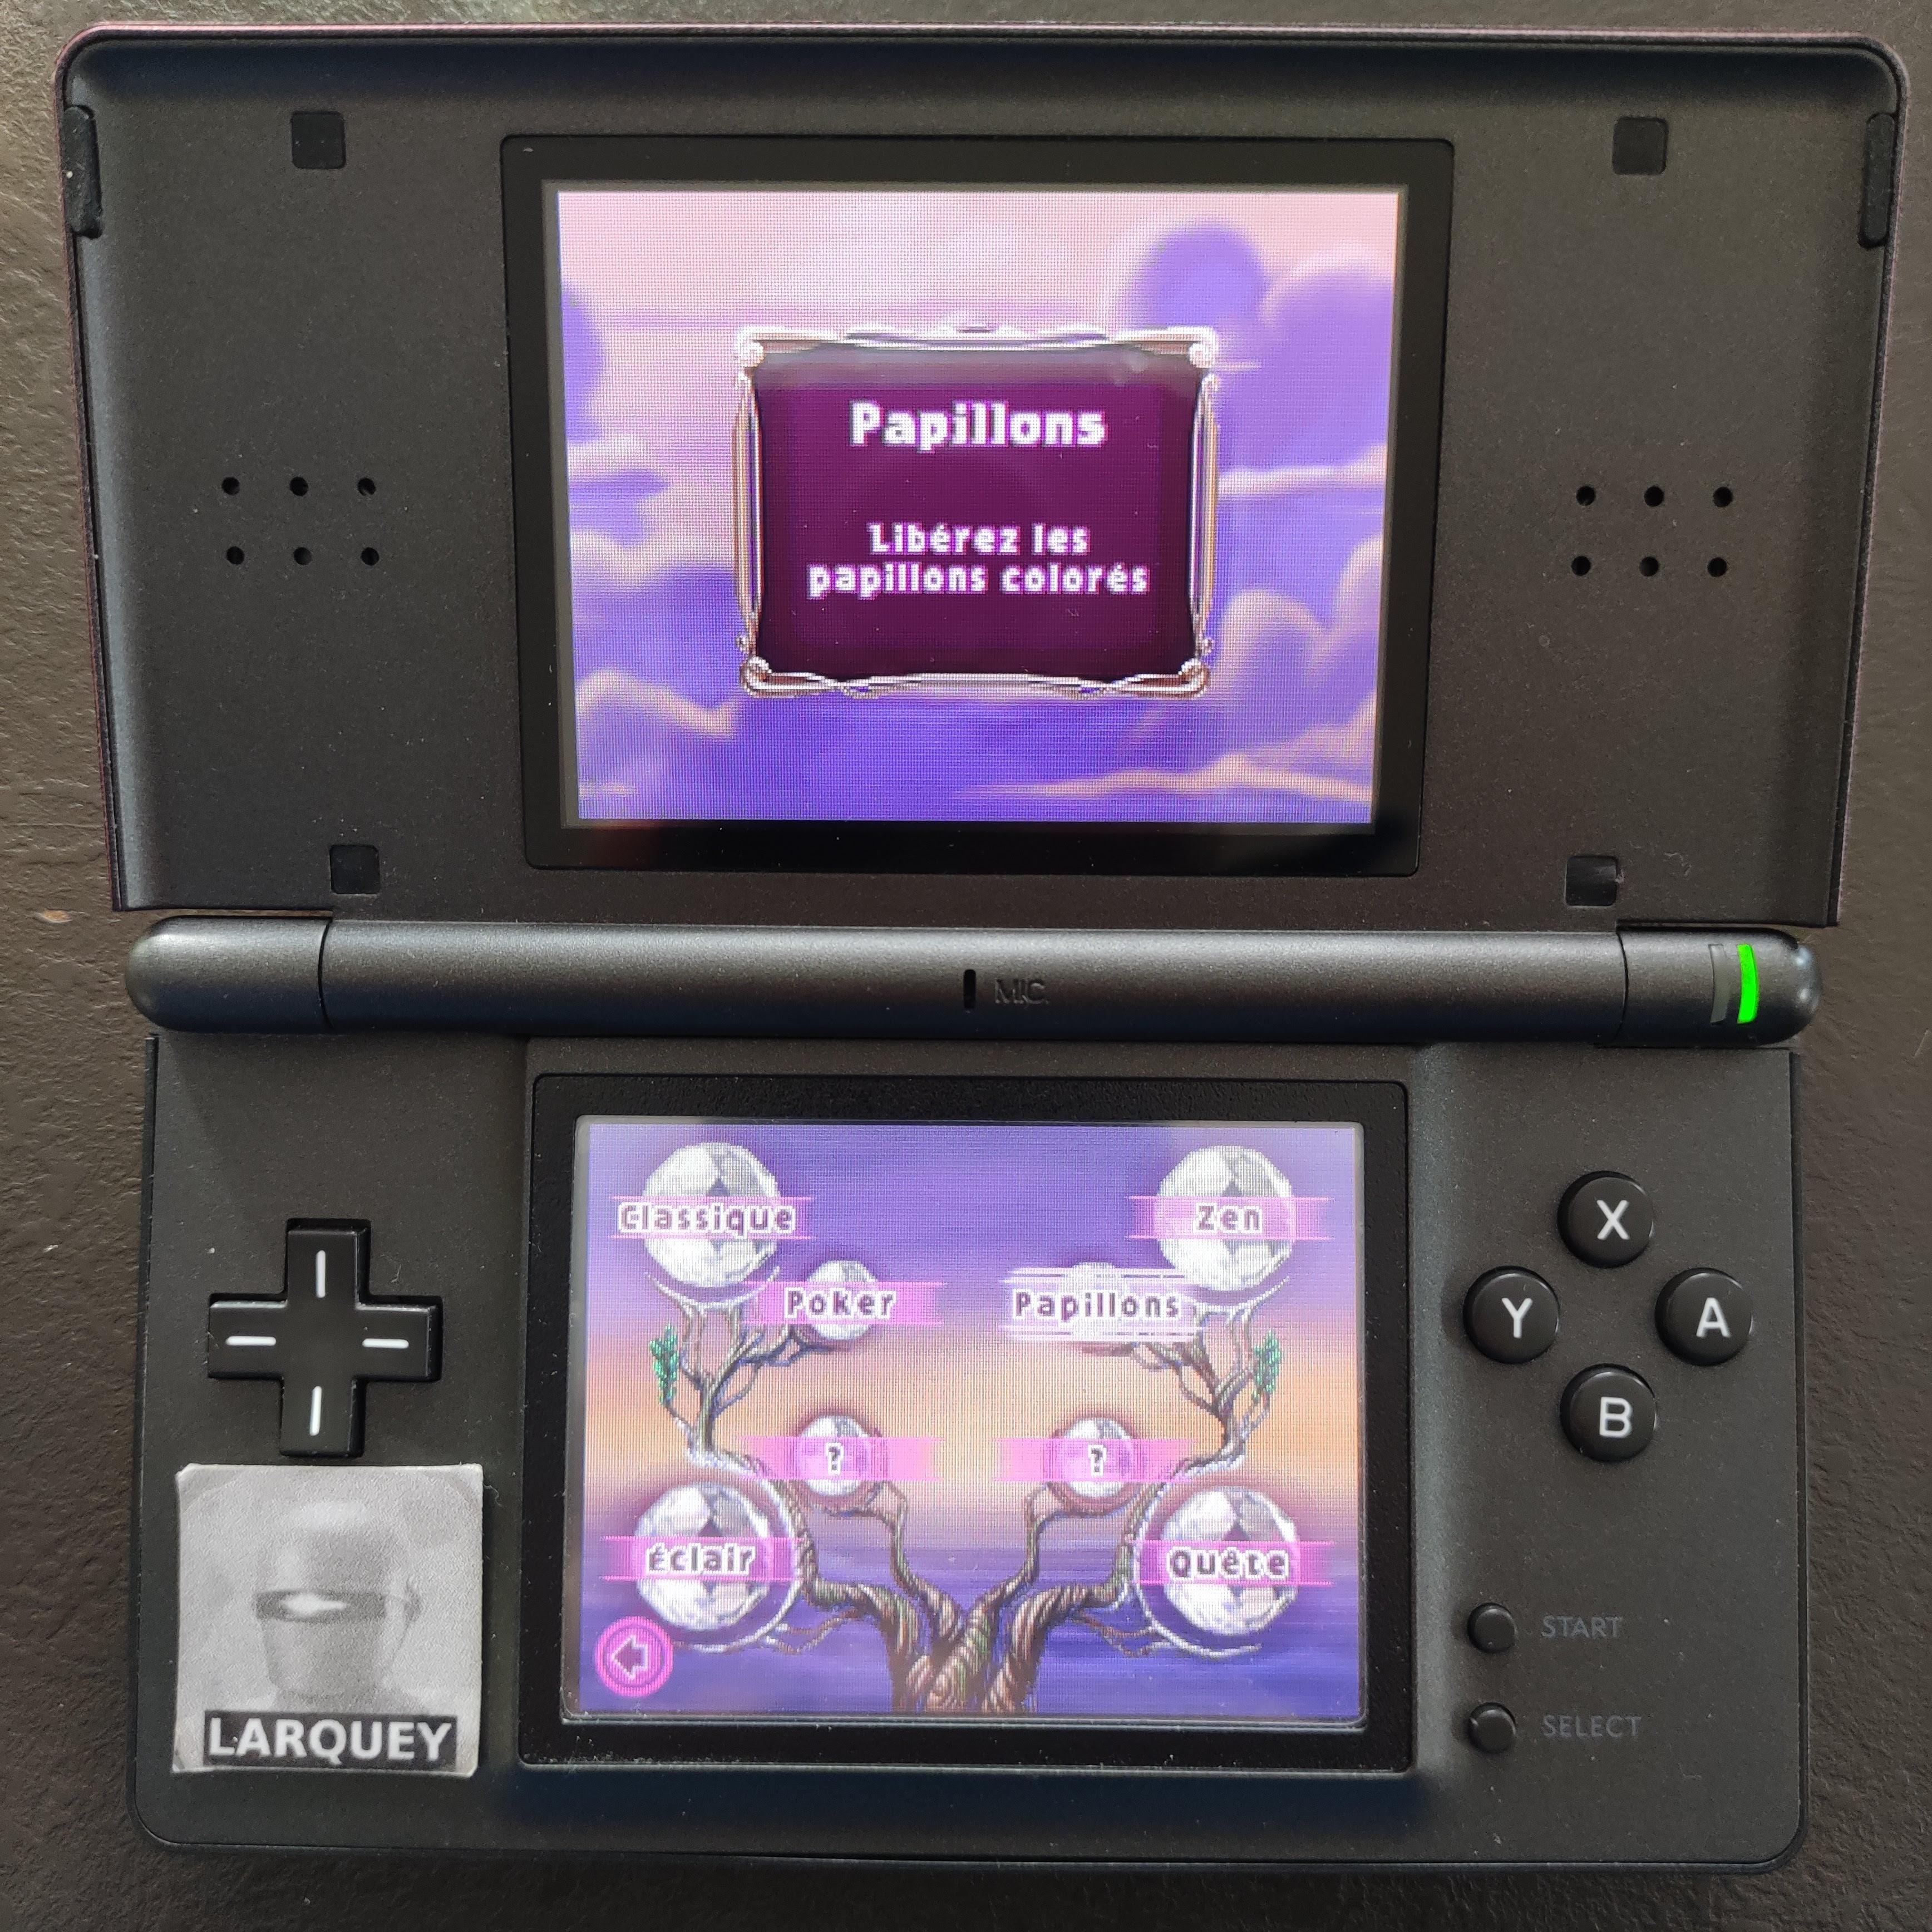 Larquey: Bejeweled 3: Butterflies [Best Butterfly Combo] (Nintendo DS) 10 points on 2020-09-27 03:59:37